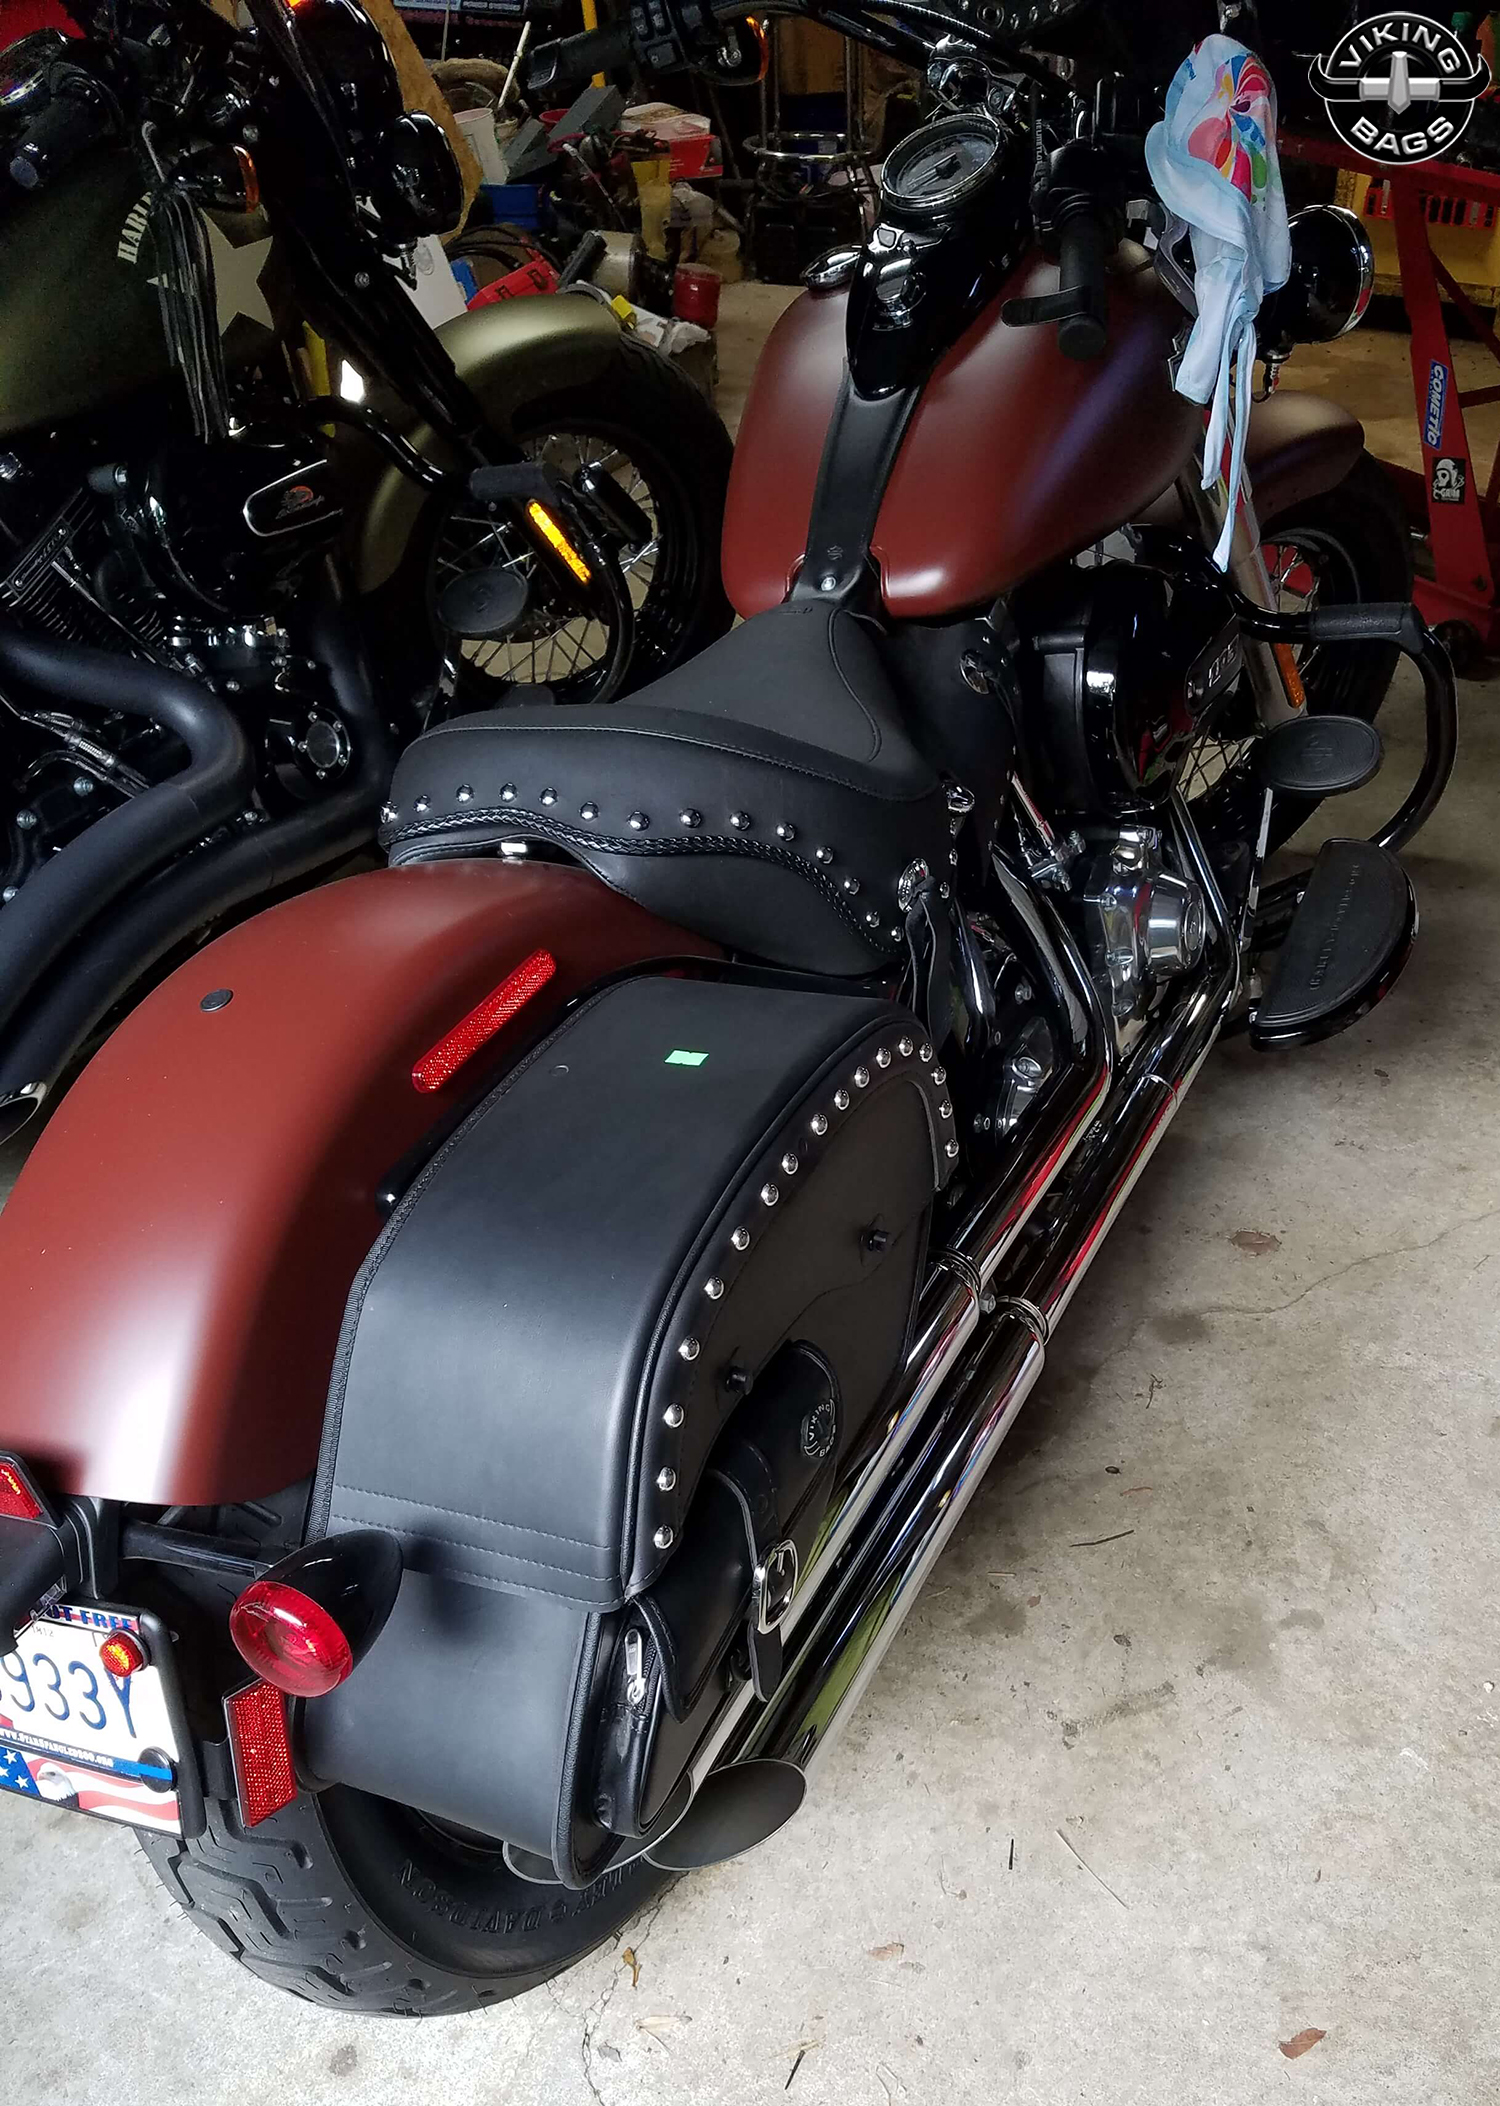 Harley Davidson Saddlebags: Throw Over Saddlebags For Harley Softail